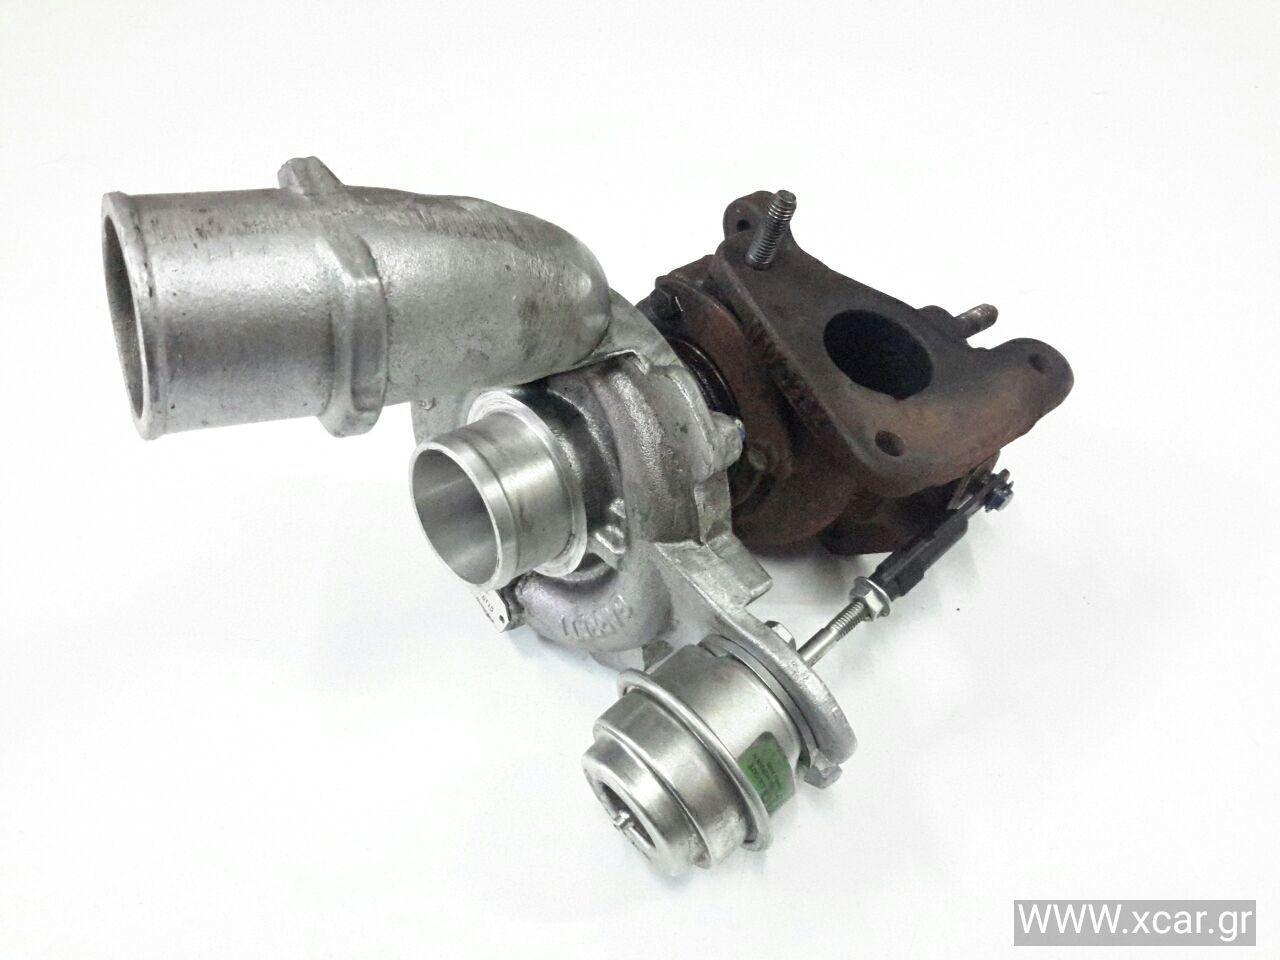 Turbo-Τουρμπίνα RENAULT MEGANE ( LA  } Sedan / 4dr 1999 - 2002 1900 (F9Q731 } Diesel 98 dTi #7517685004S